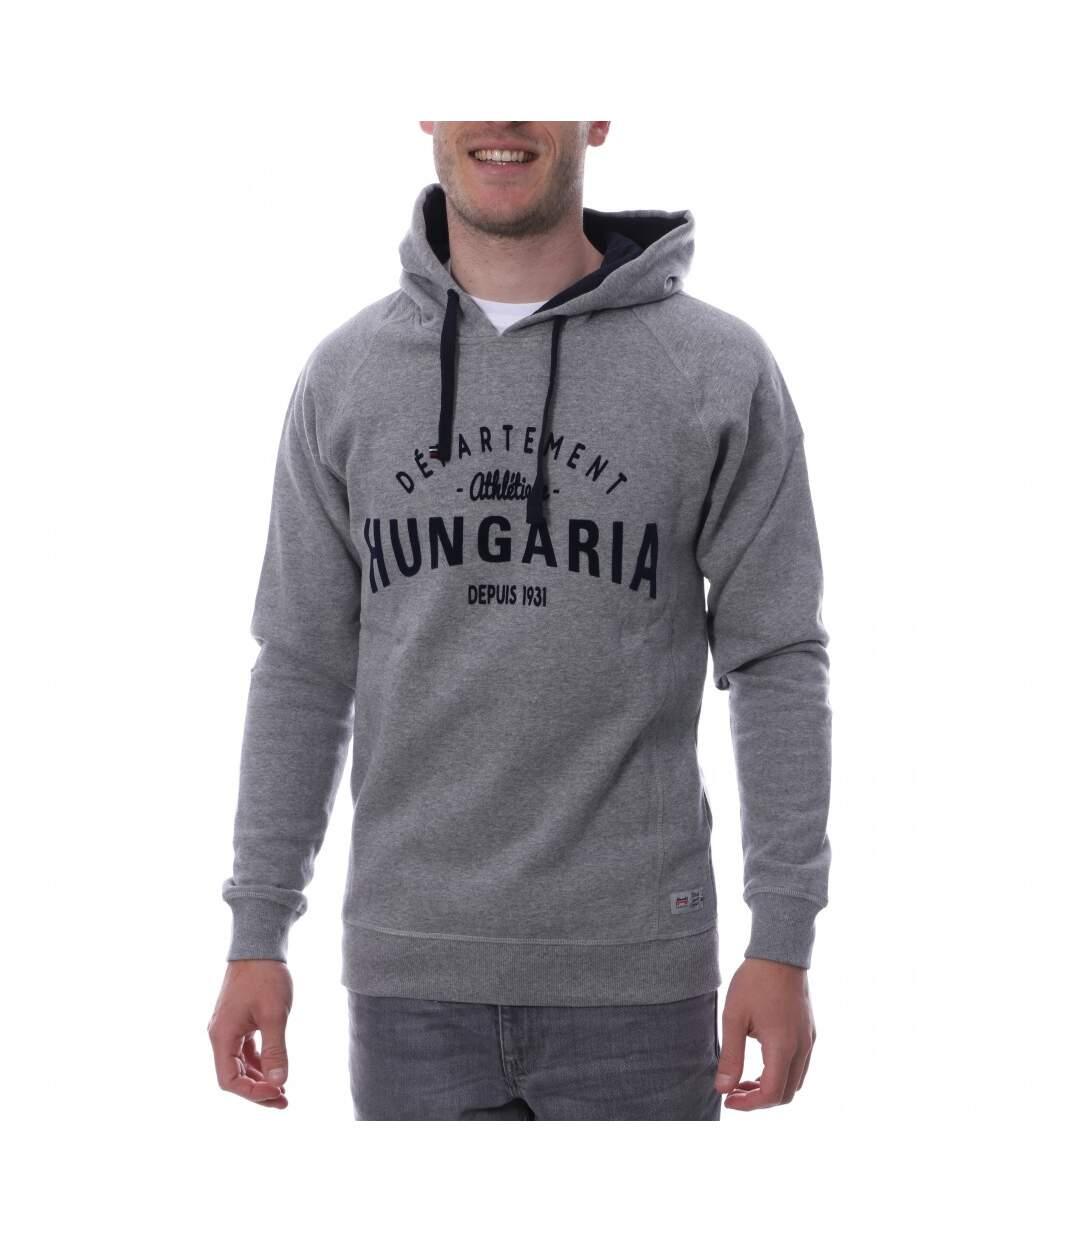 Sweat à capuche gris homme Hungaria Sport Style